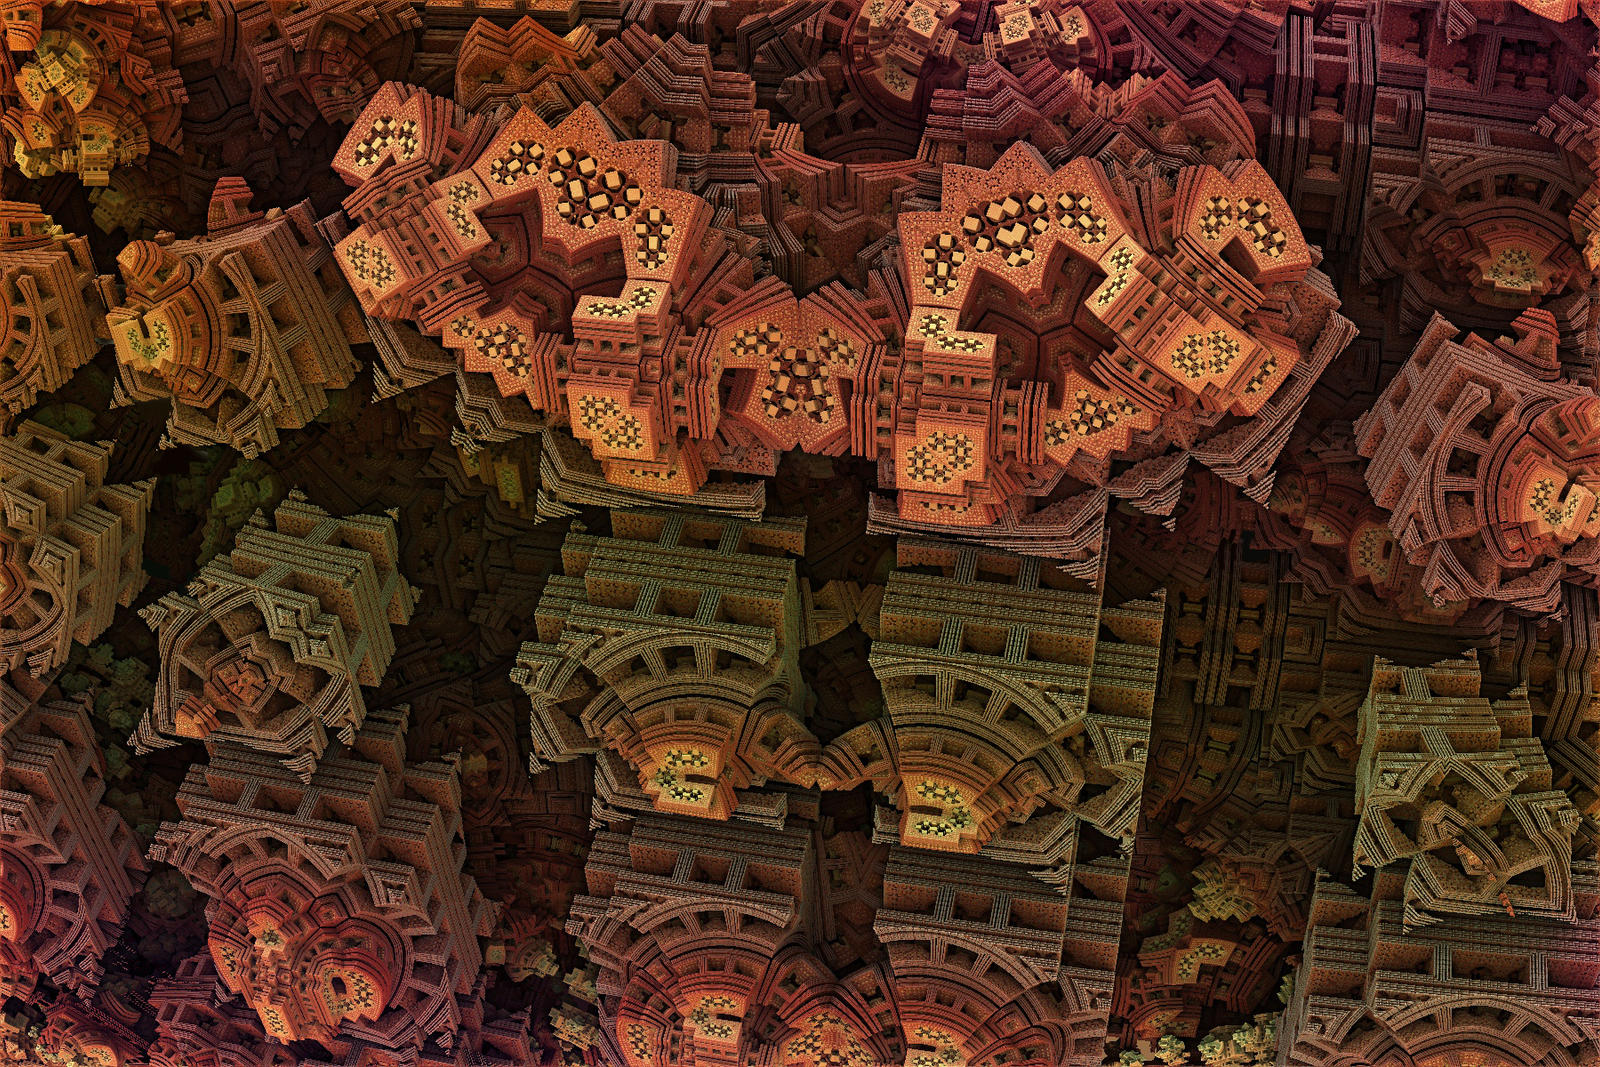 Brokedown Palace by Taojoe